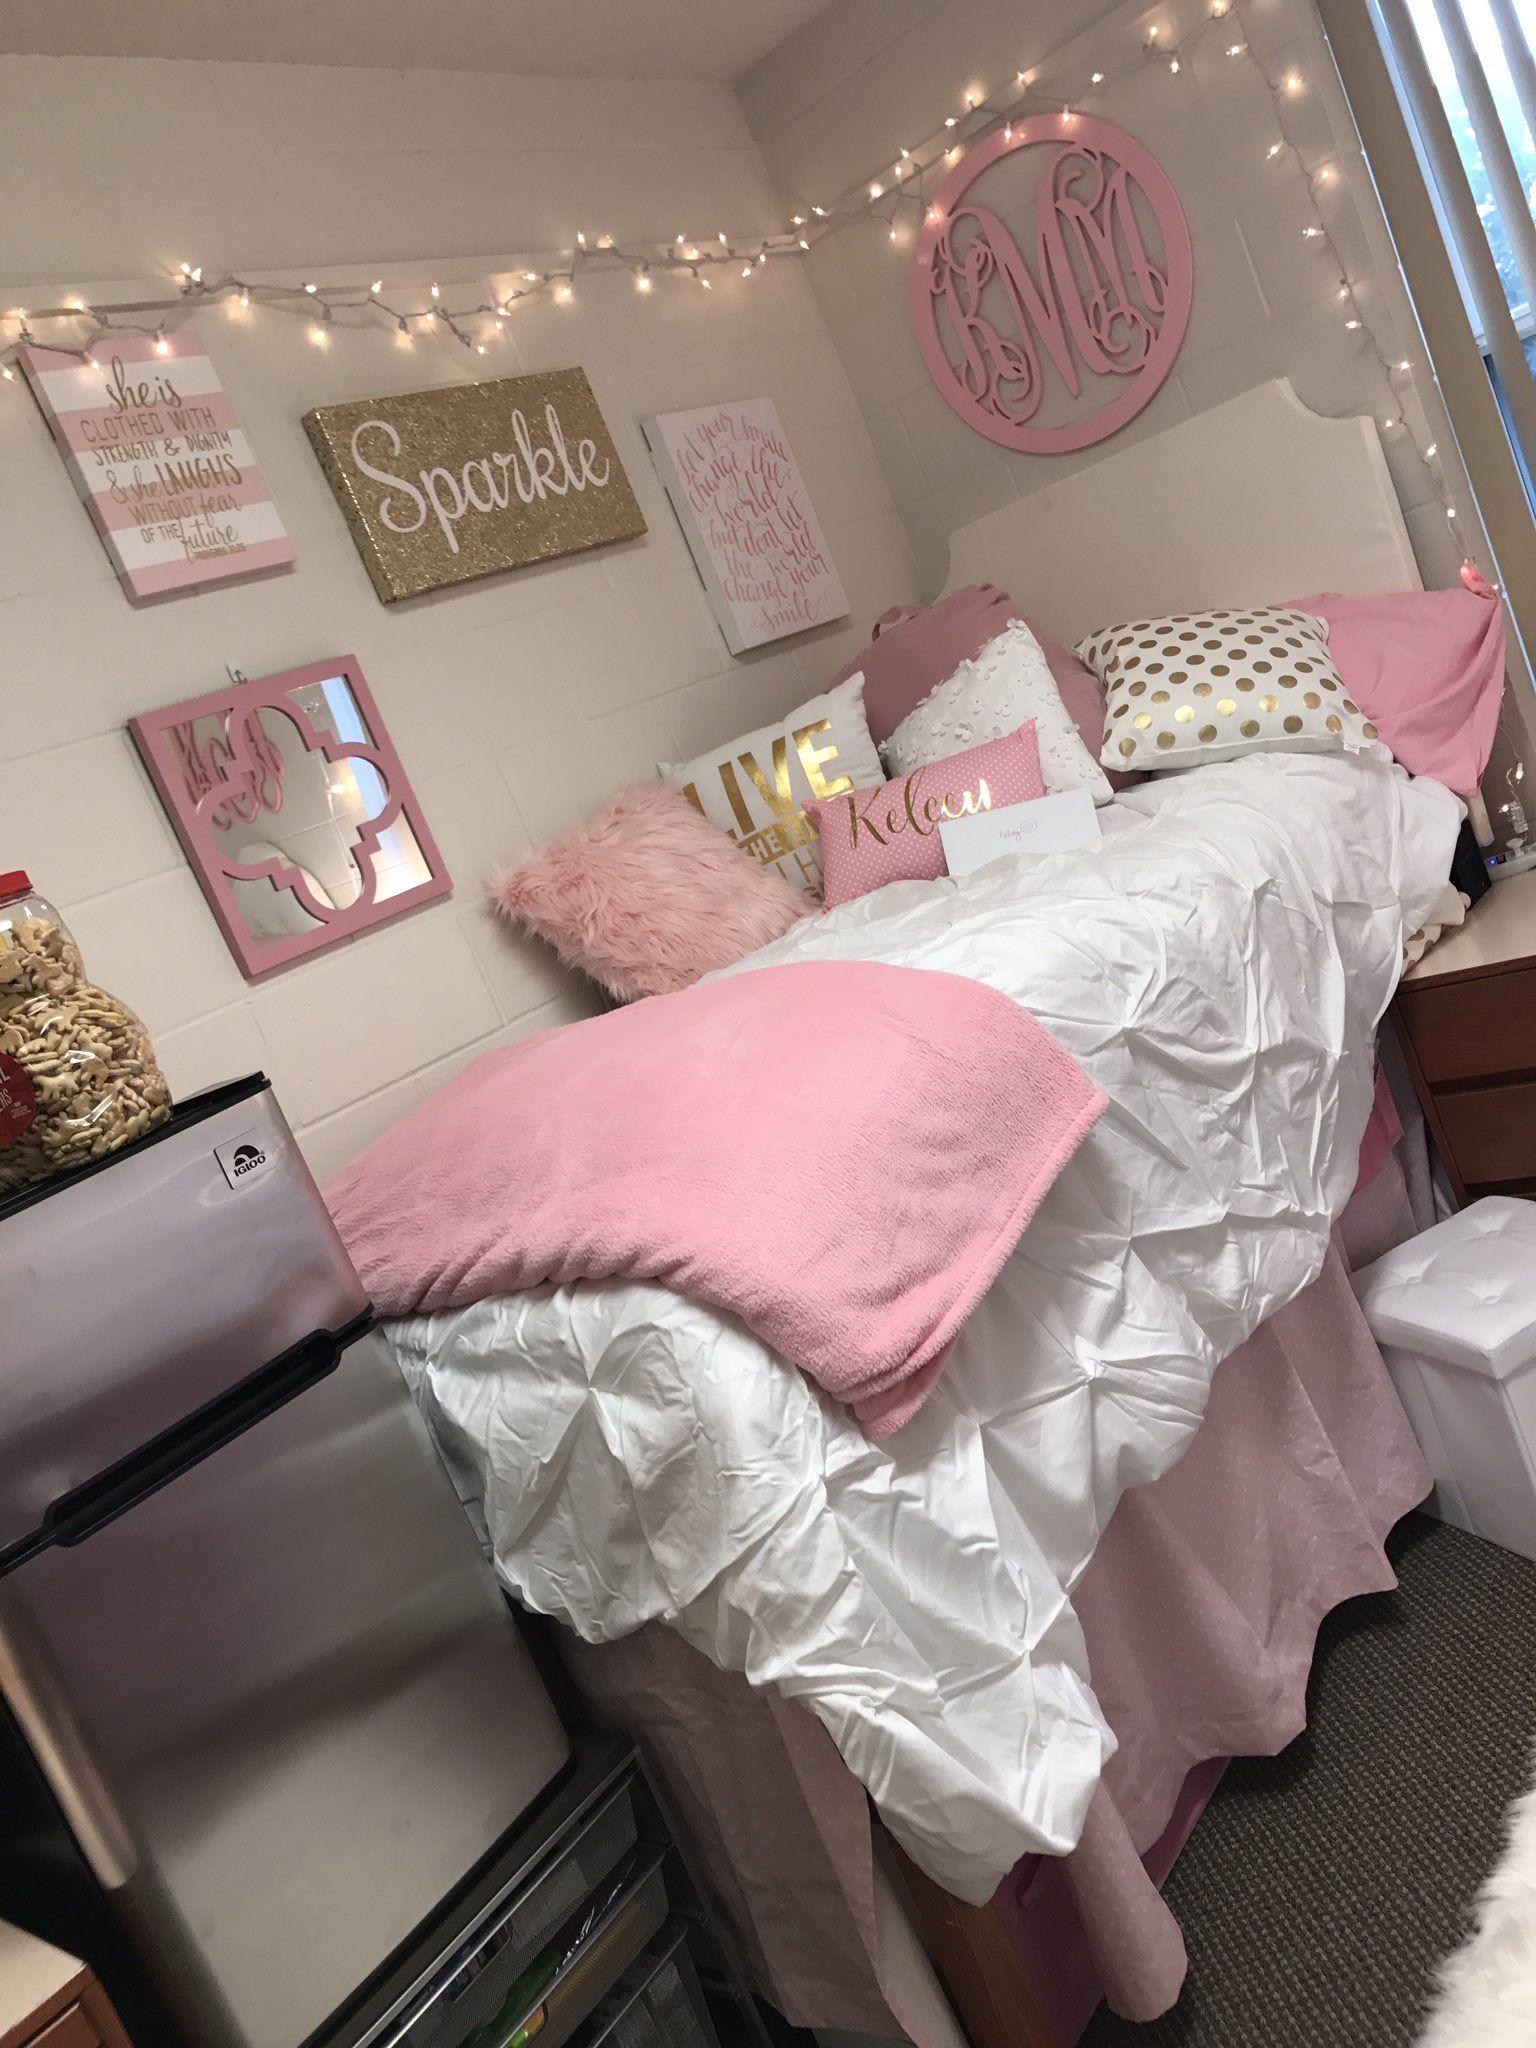 Enjoyable P I N T E R E S T Wavykiara Princesses Bedrooms Home Interior And Landscaping Ferensignezvosmurscom